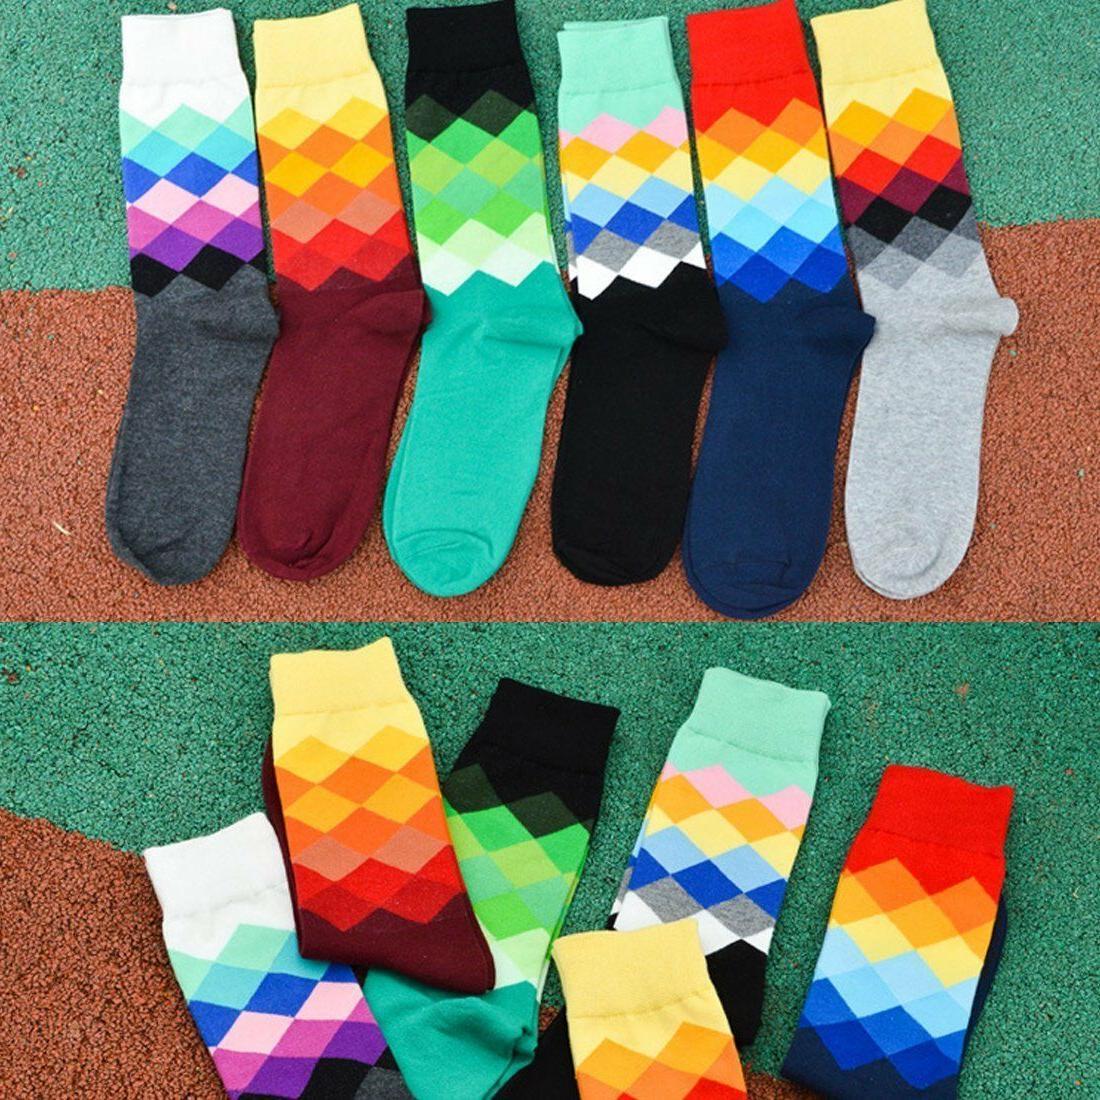 Mens Argyle Socks 6-Pair Pack Colorful Rainbow Fits Shoe Size 6-12